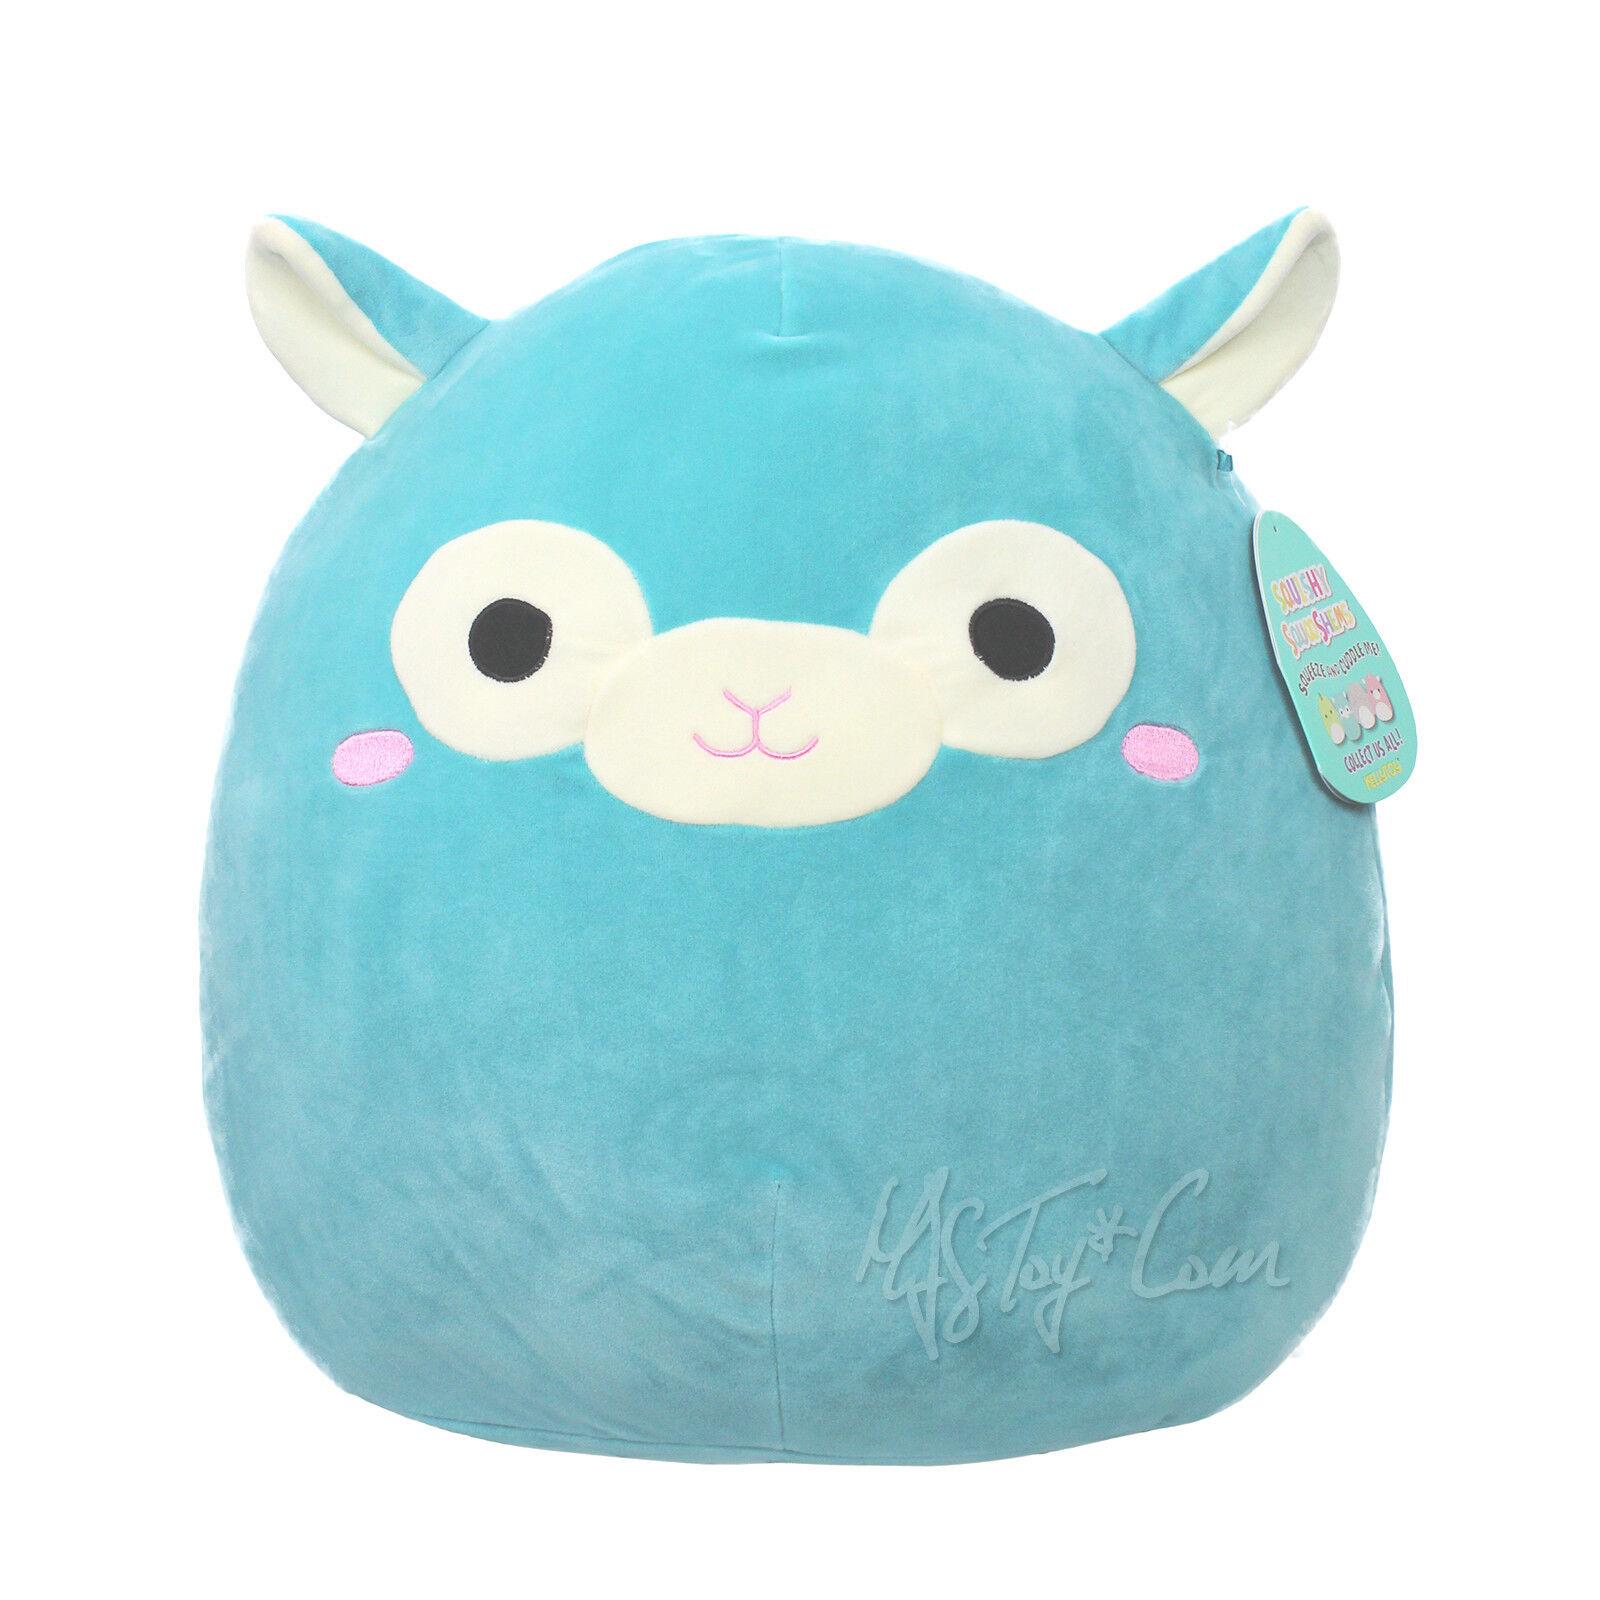 NWT KellyToy Squishy Squooshems Squeeze Cuddle Me Plush Pillow Doll blu TIM 18